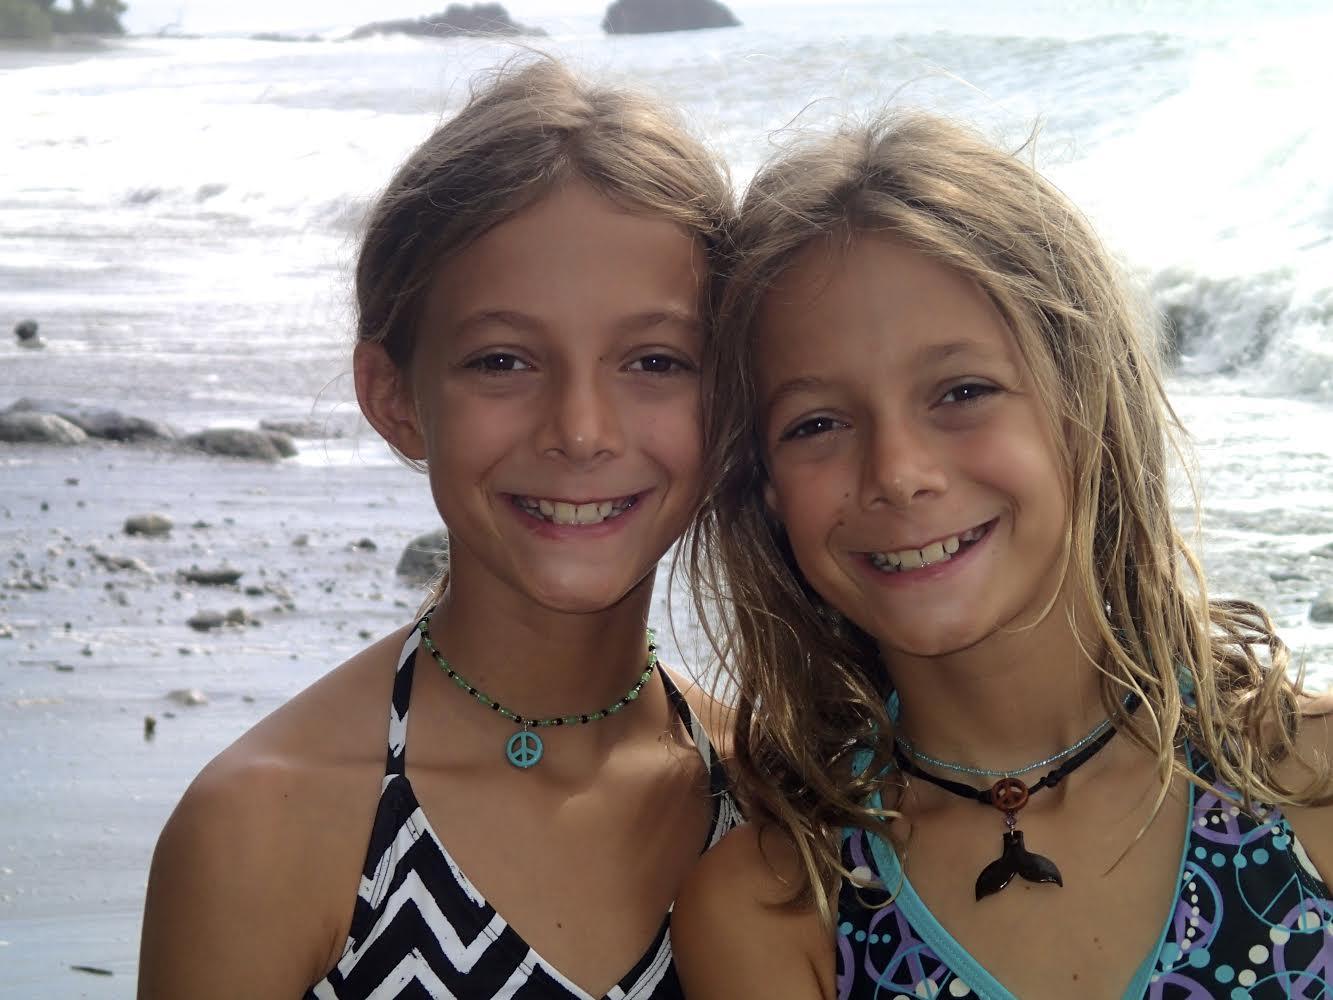 Gracie and Hailey